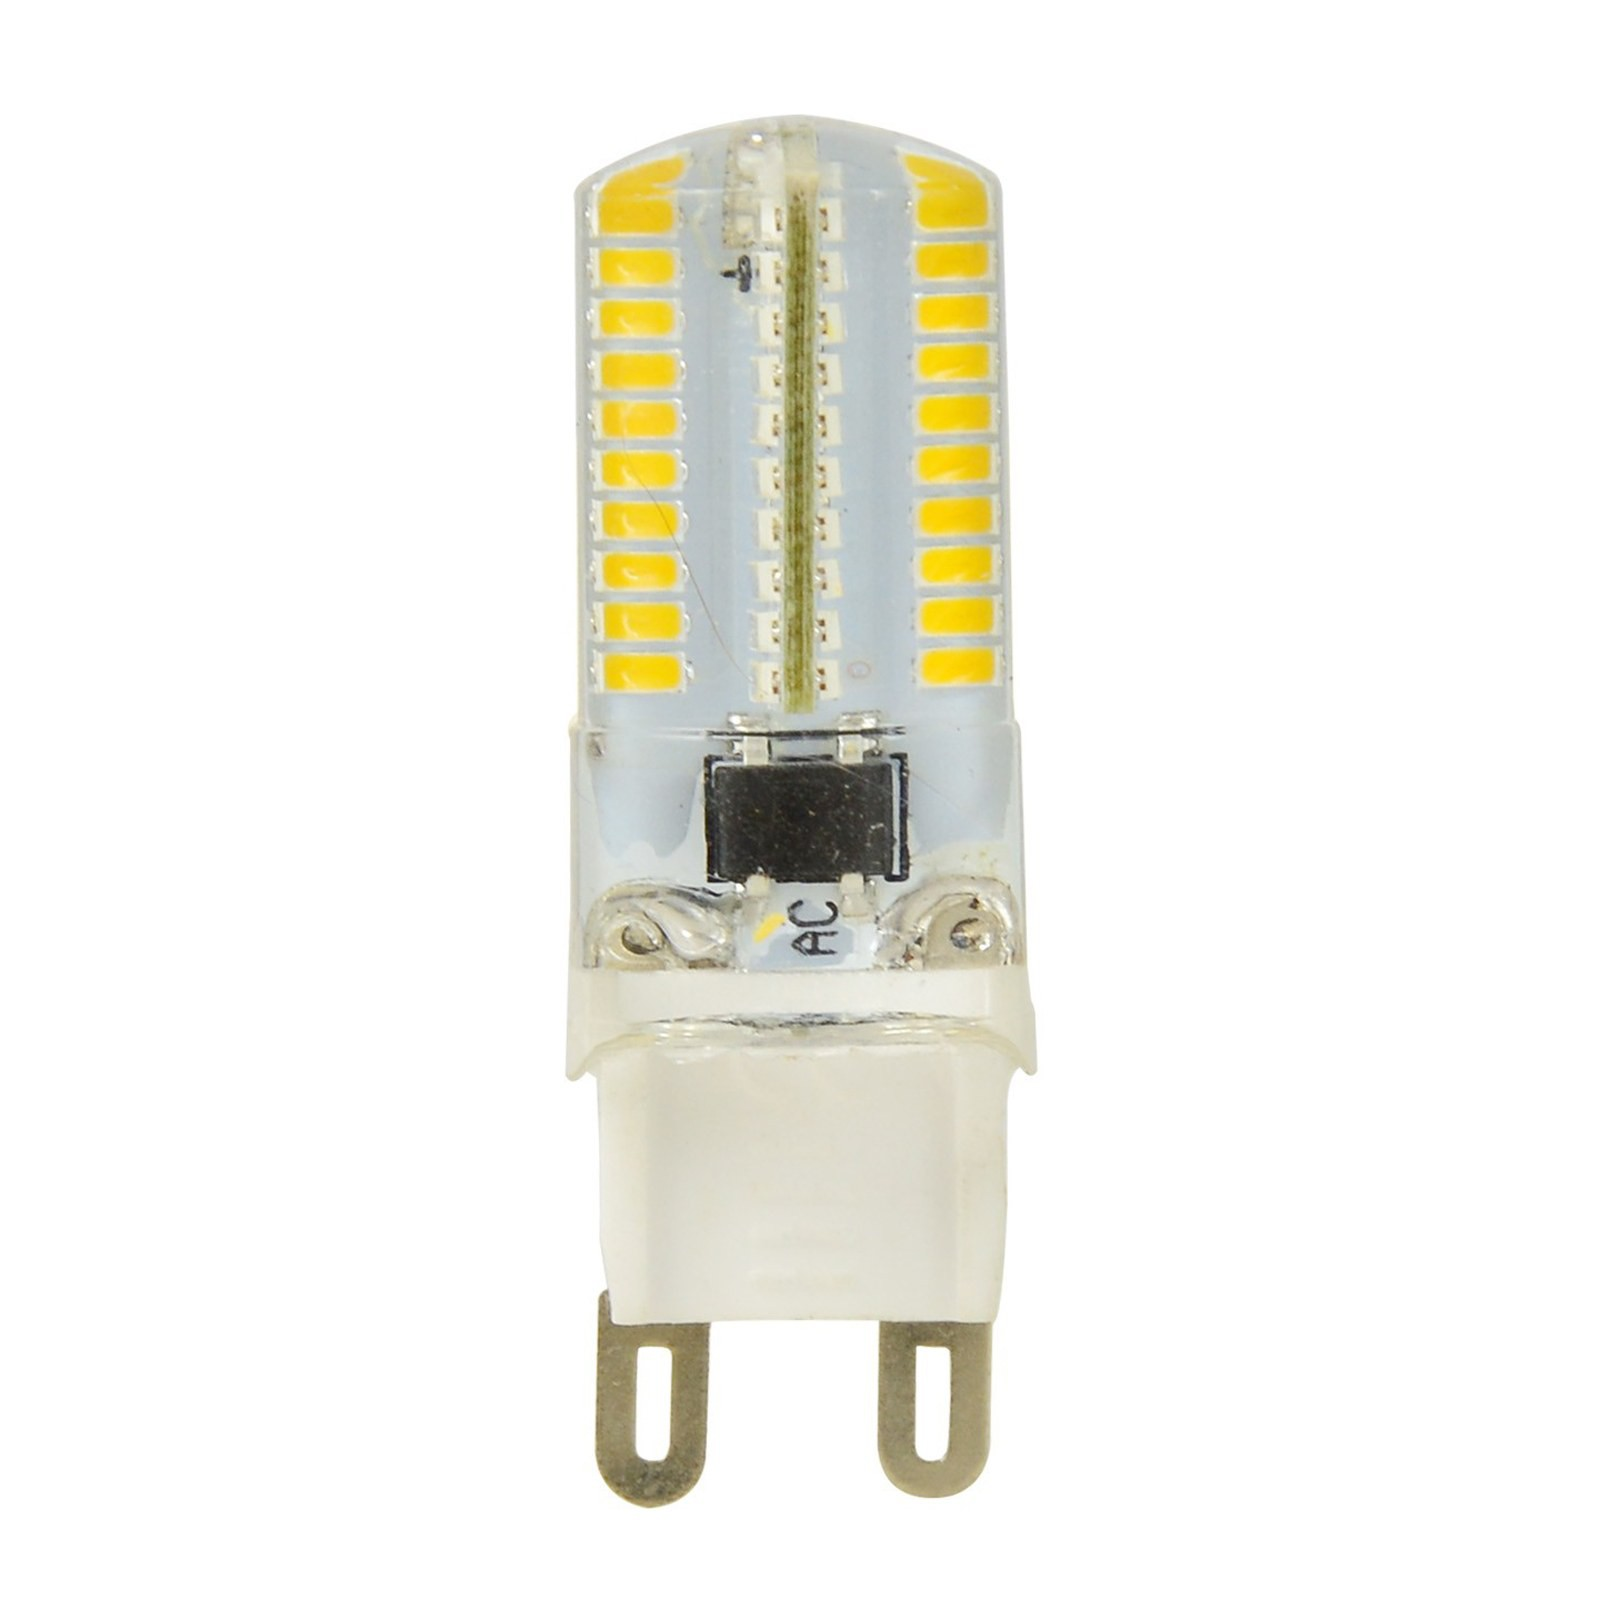 lampada led lampadina attacco g9 luce bianca calda smd life 3 watt 210 lumen area illumina. Black Bedroom Furniture Sets. Home Design Ideas